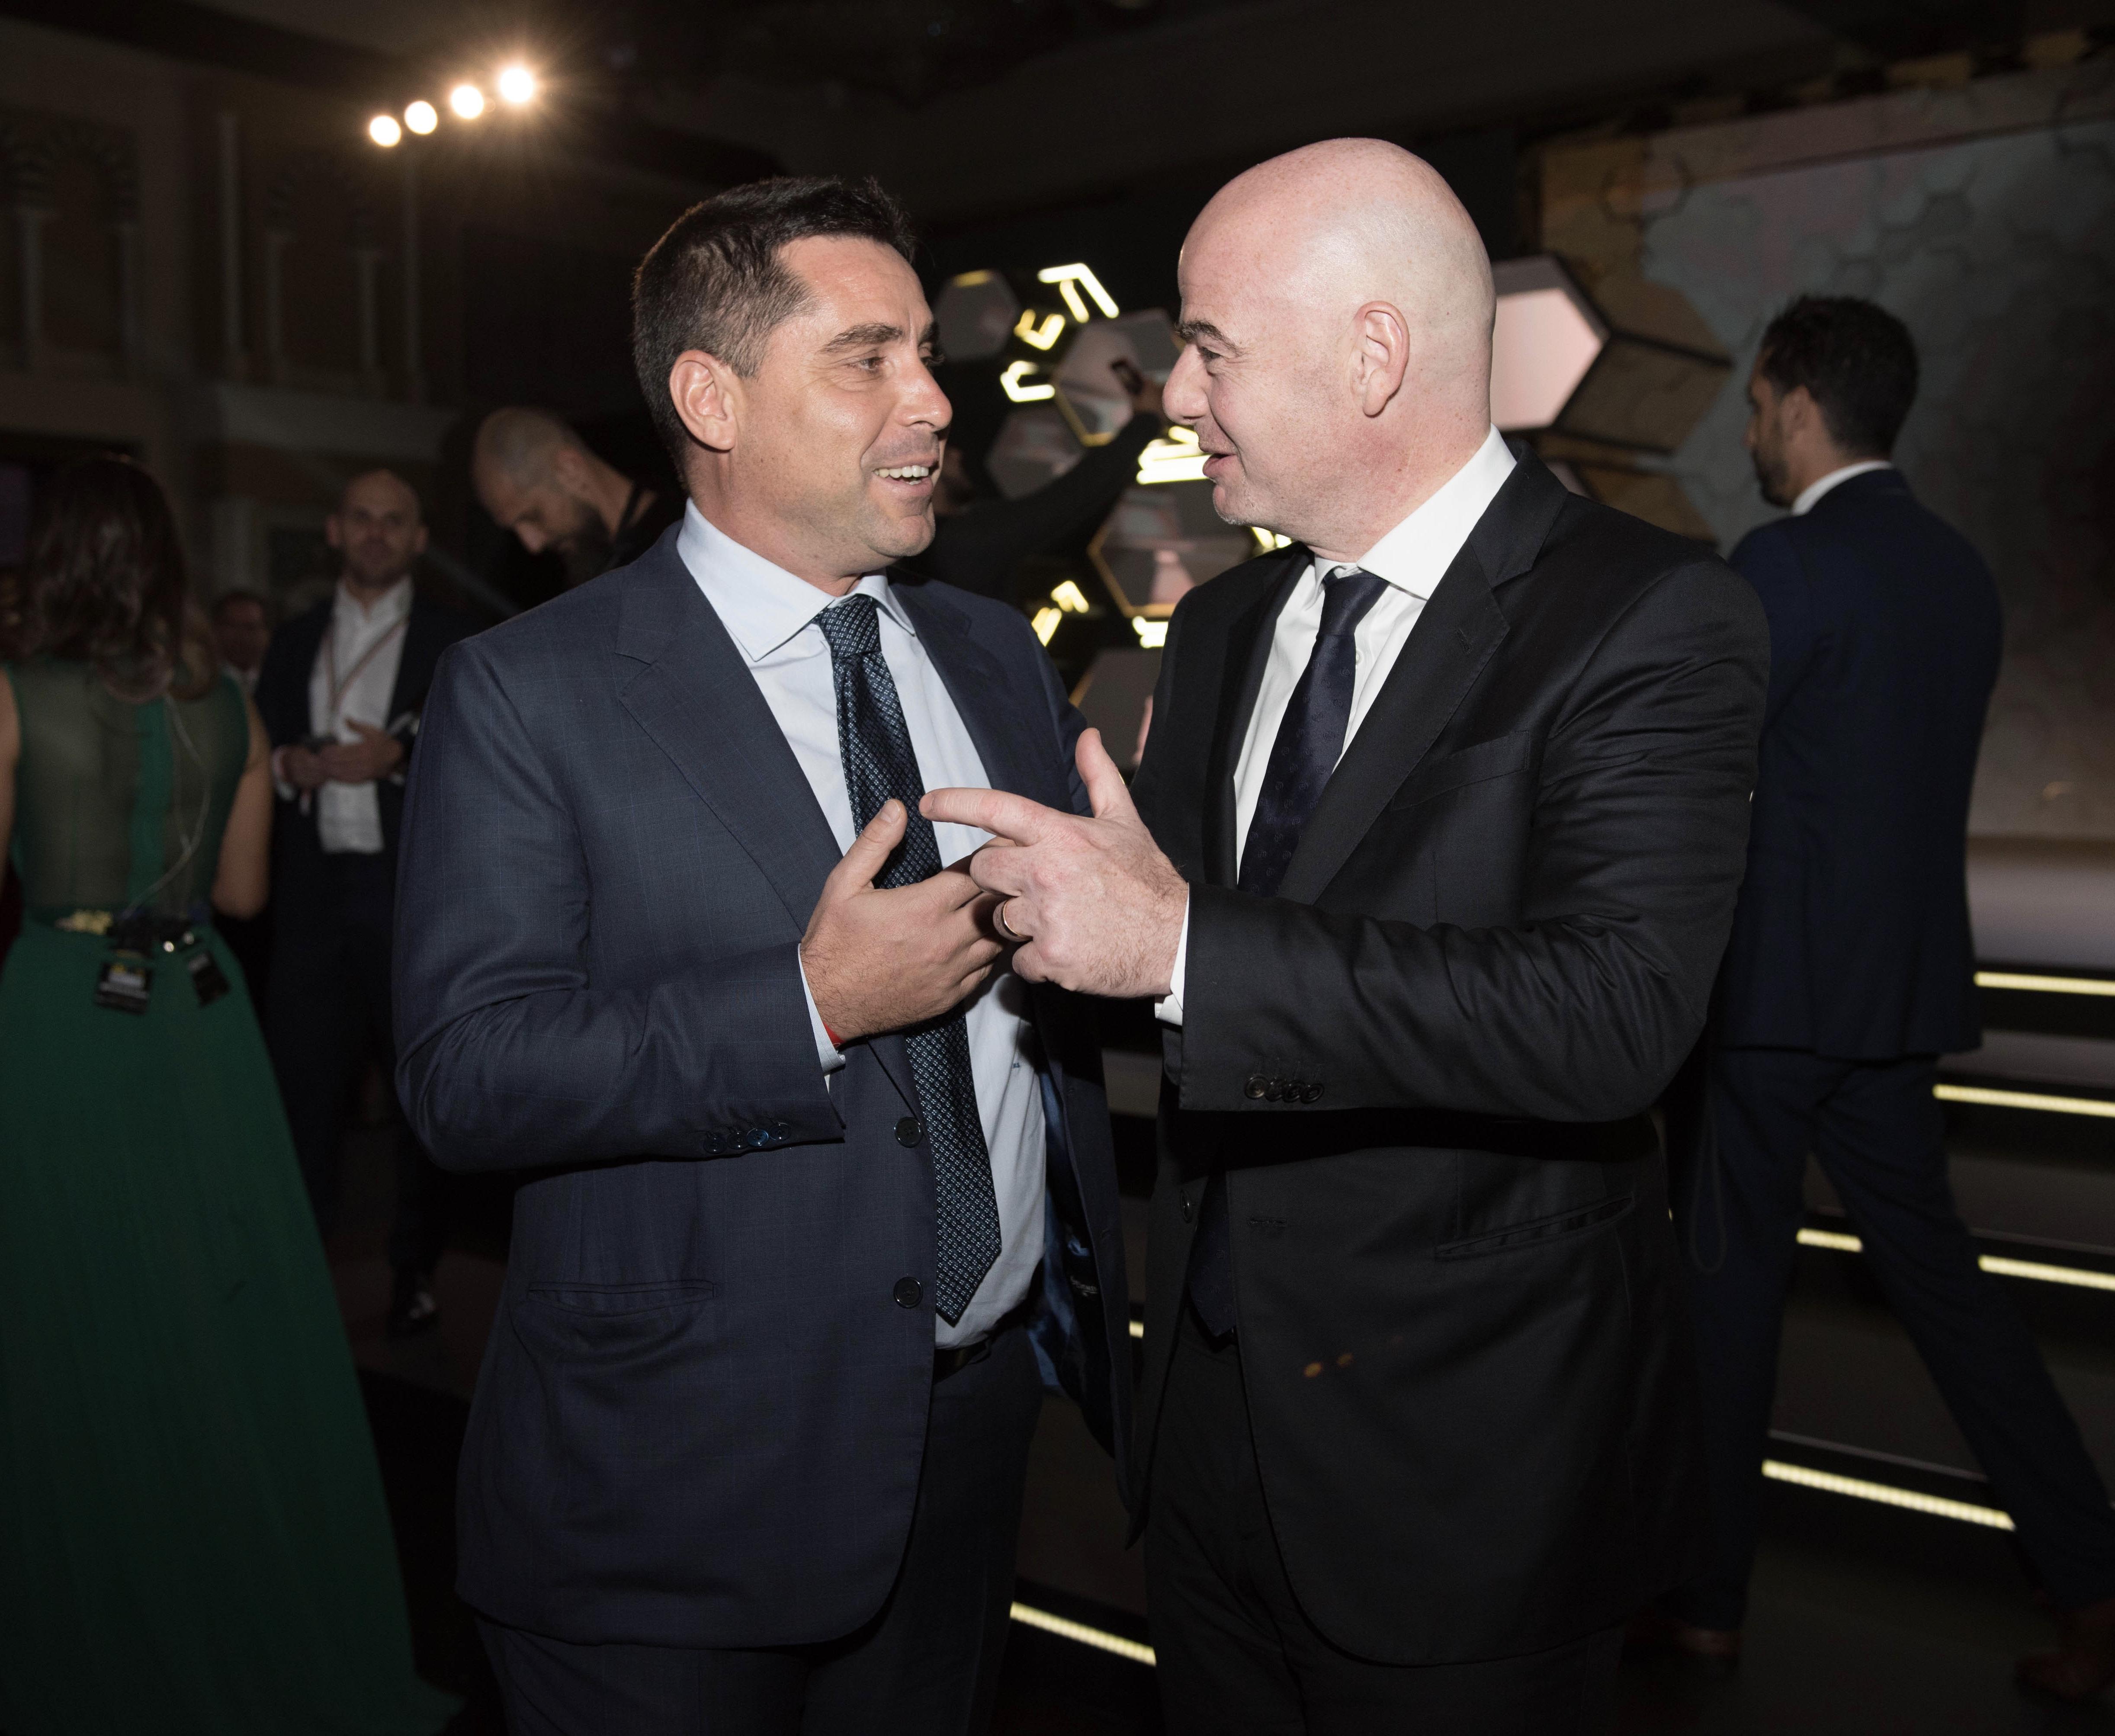 Riccardo Silva and Gianni Infantino, President of FIFA at the Globe Soccer Awards – Dubai 2017